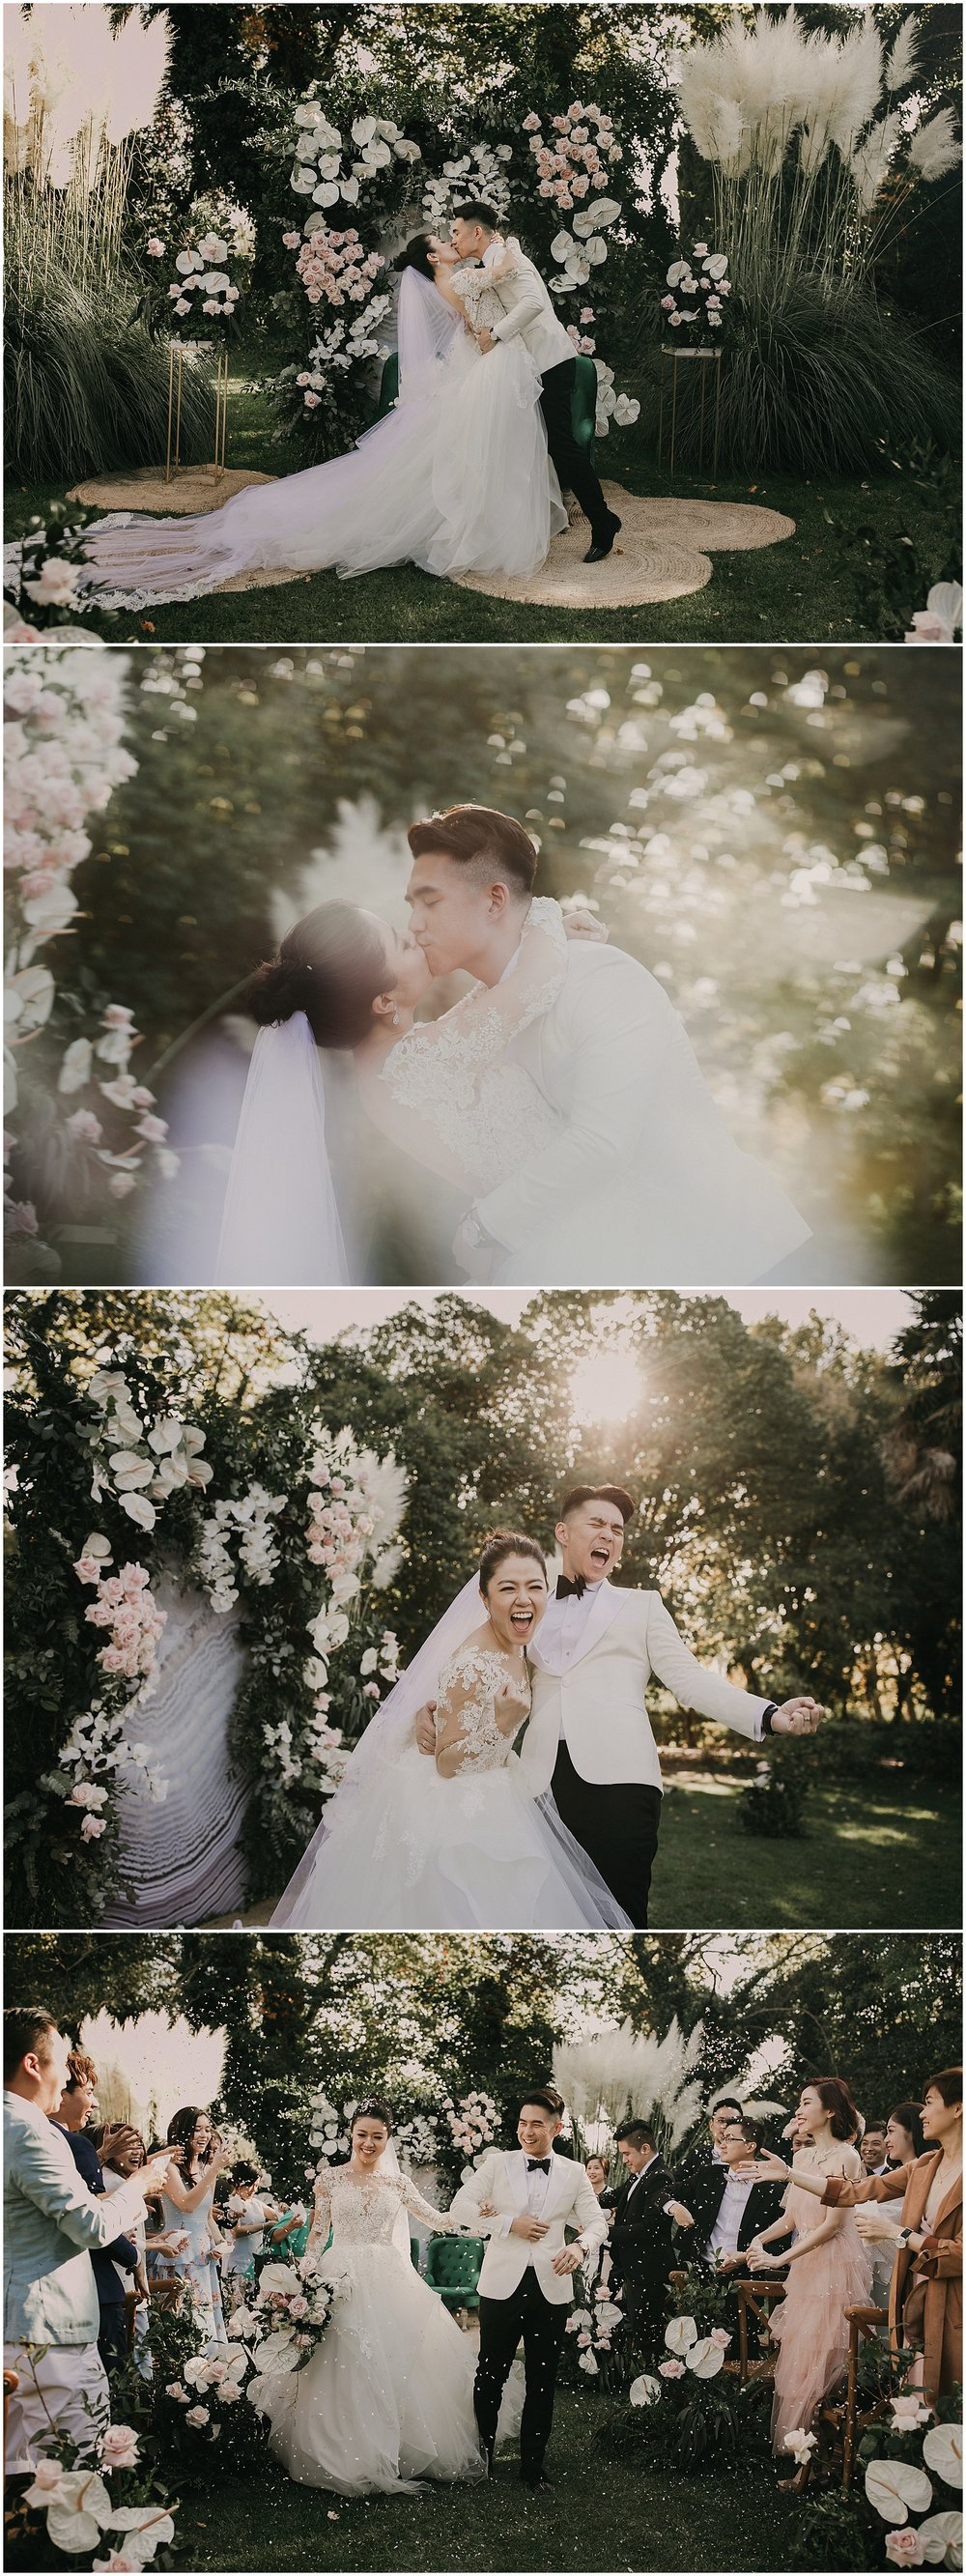 Malaysia wedding 014.JPG